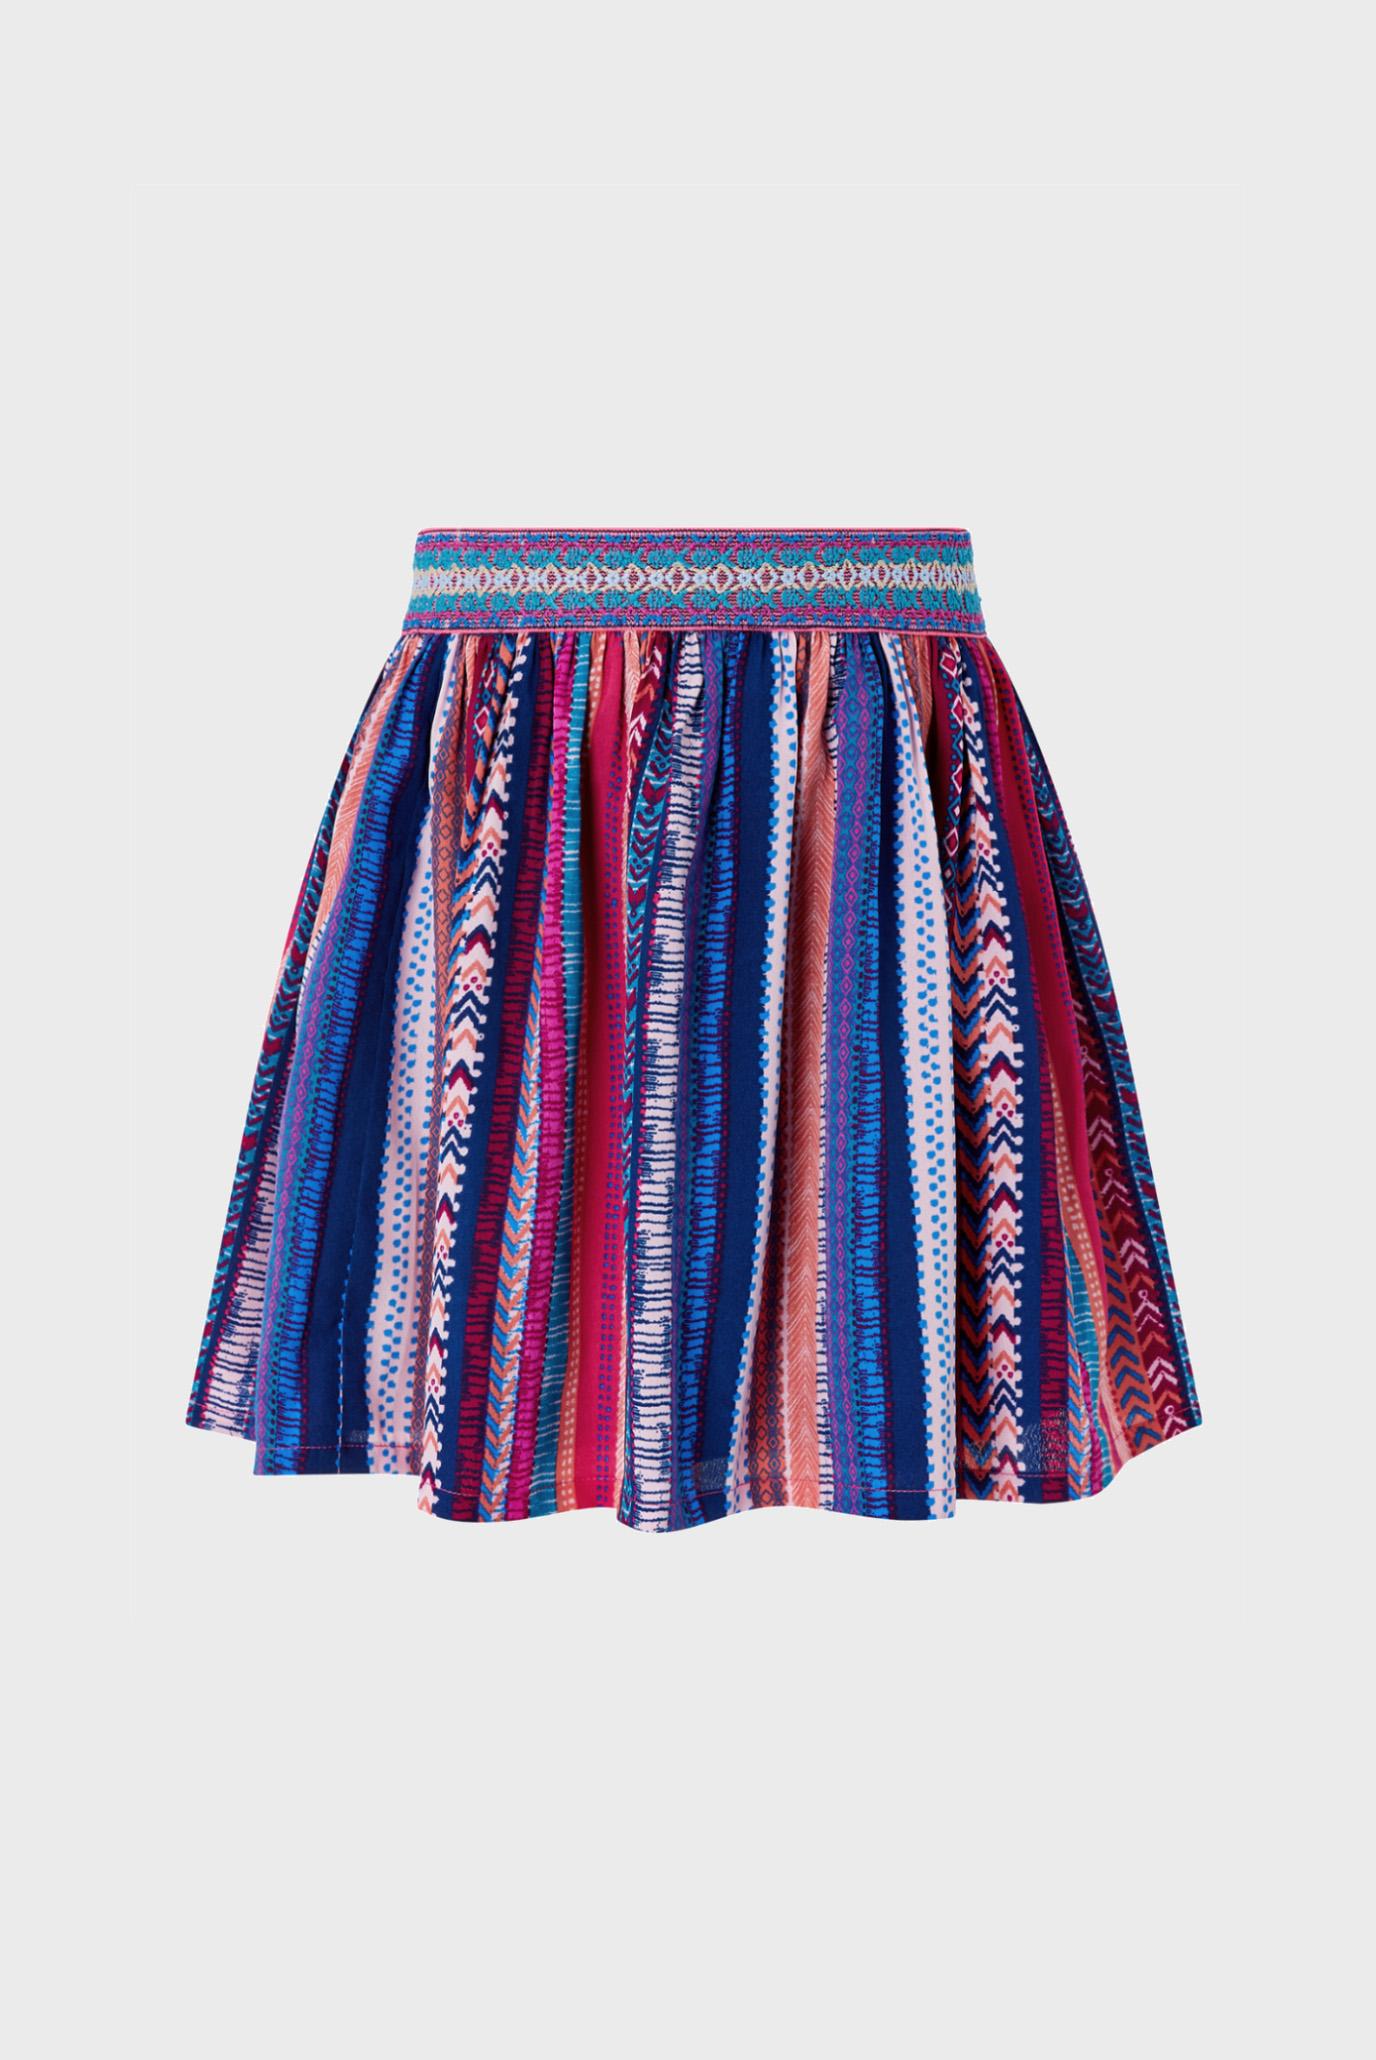 Детская юбка в полоску S.E.W SOPHIE SKIRT 1